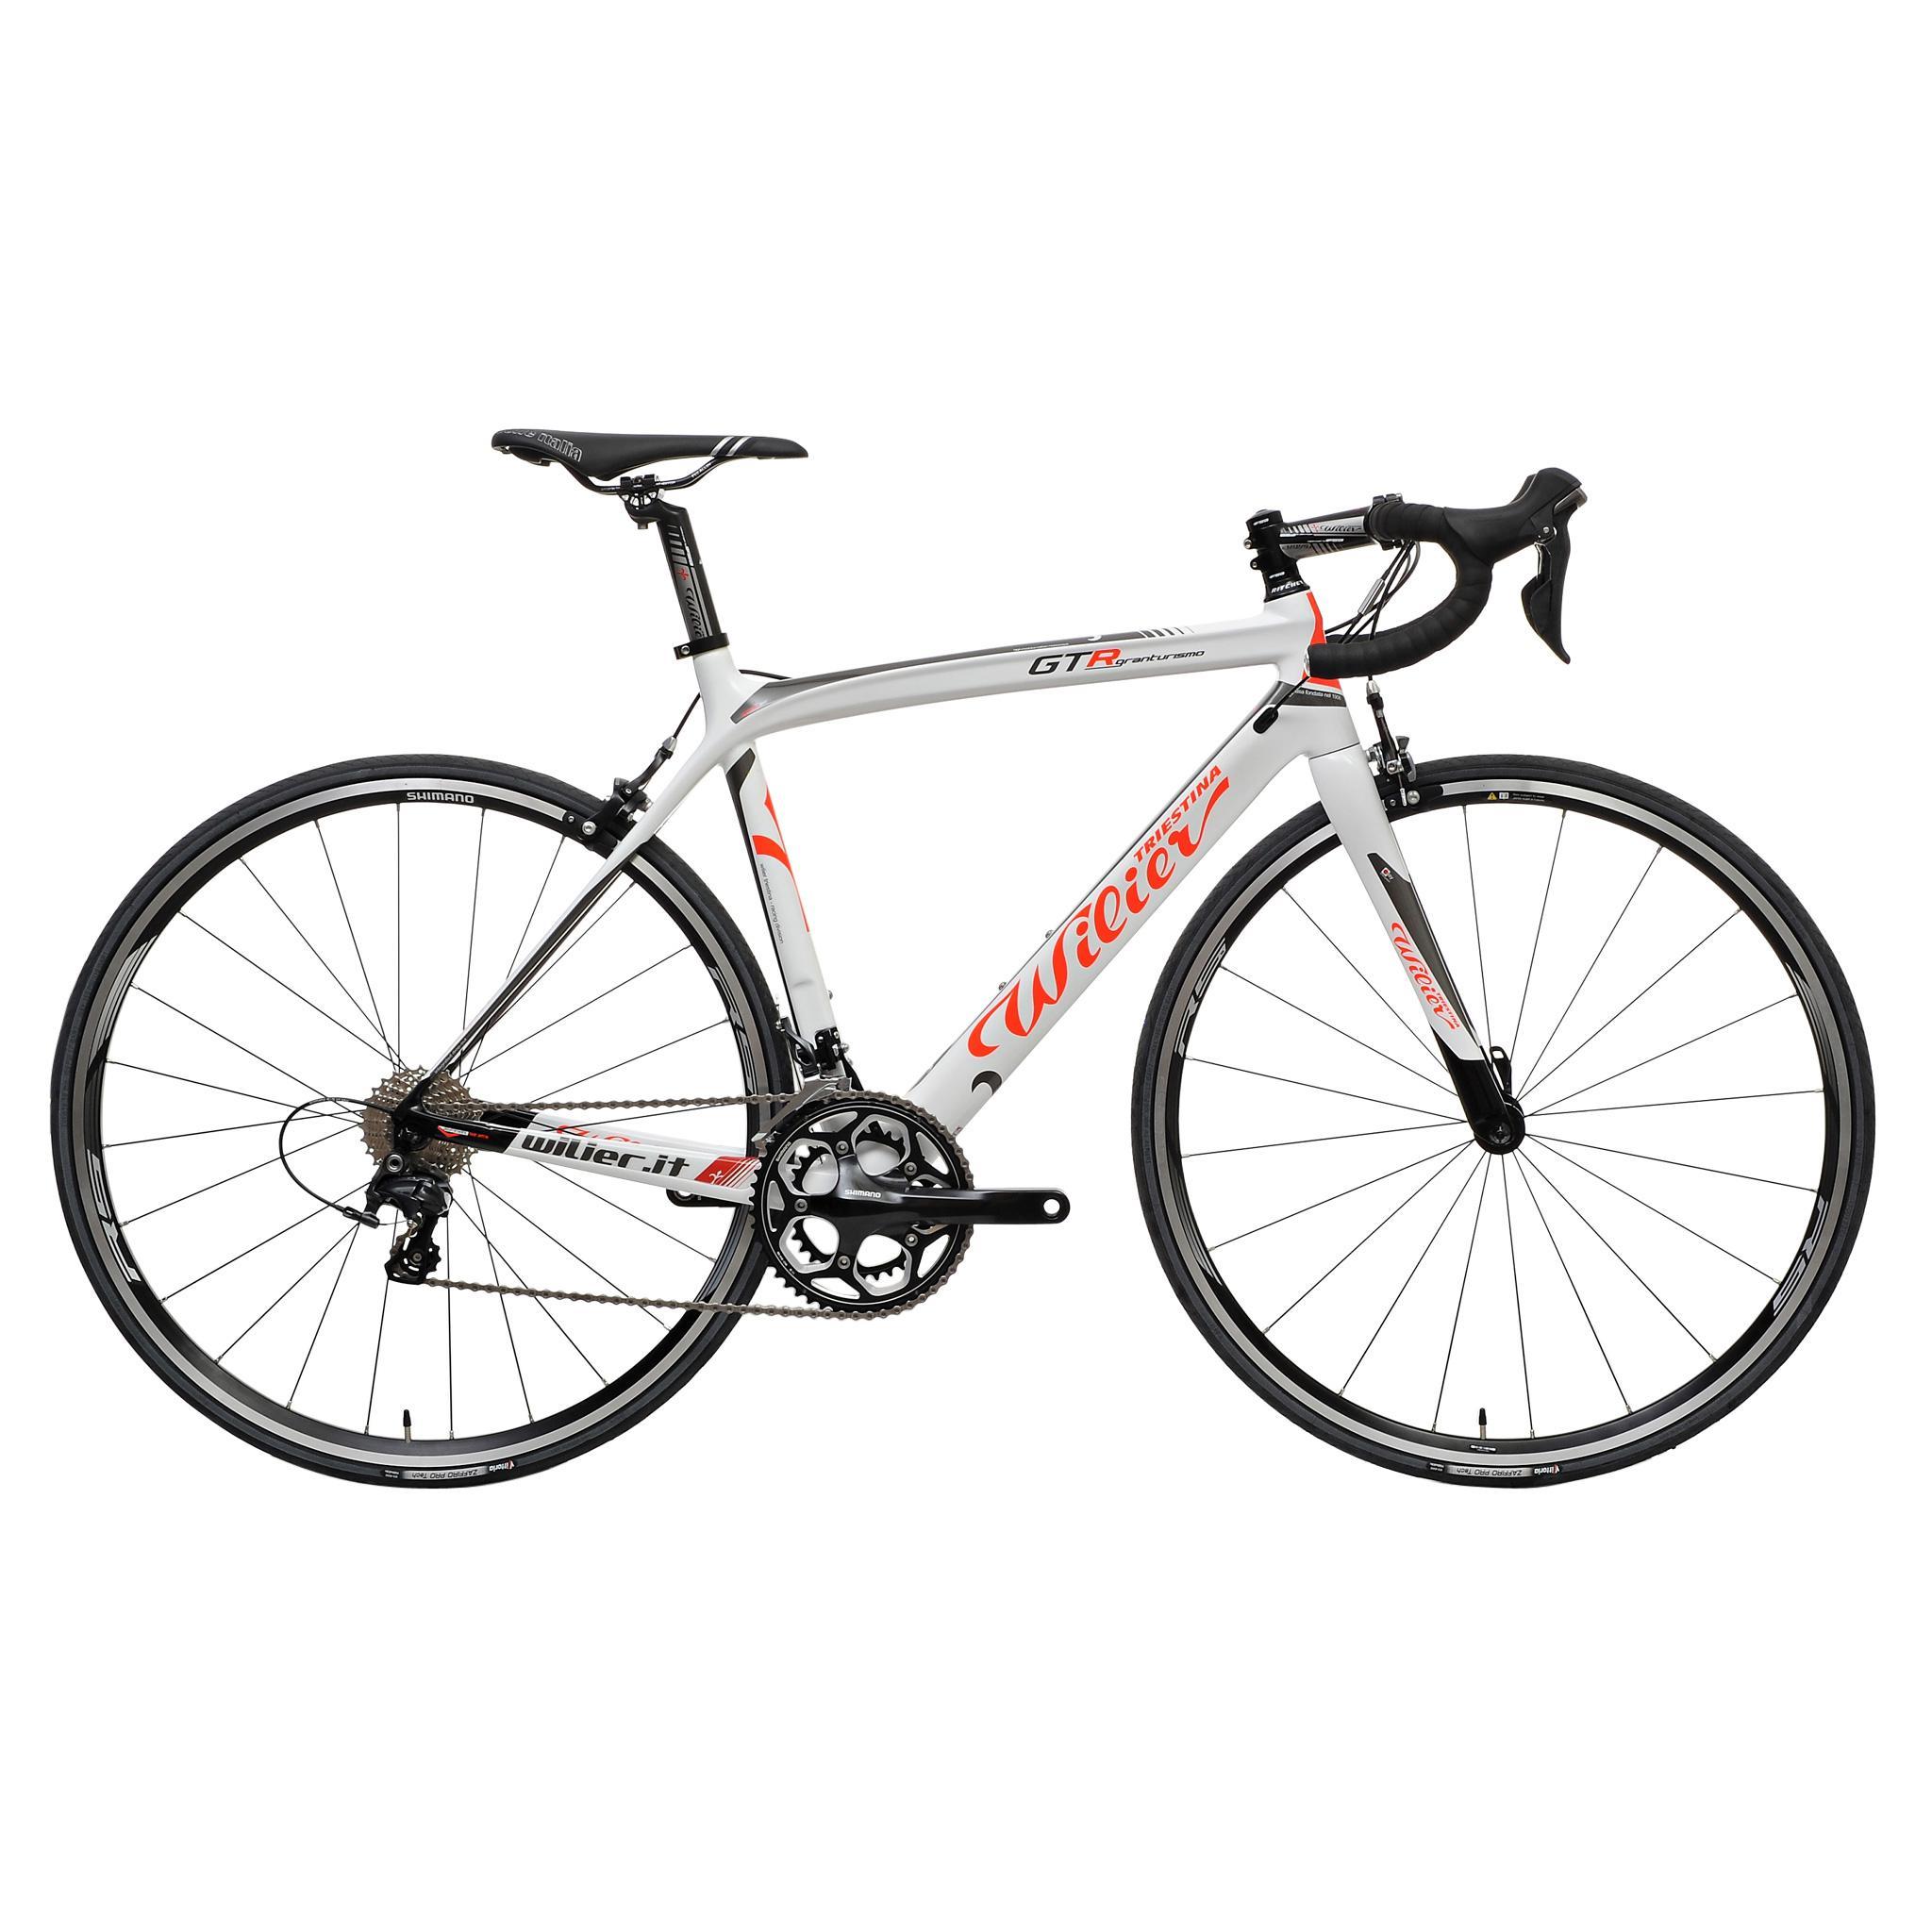 Vélo de course Wilier Triestina GTR Shimano Ultegra 6800 34/50 Blanc/Rouge 2015